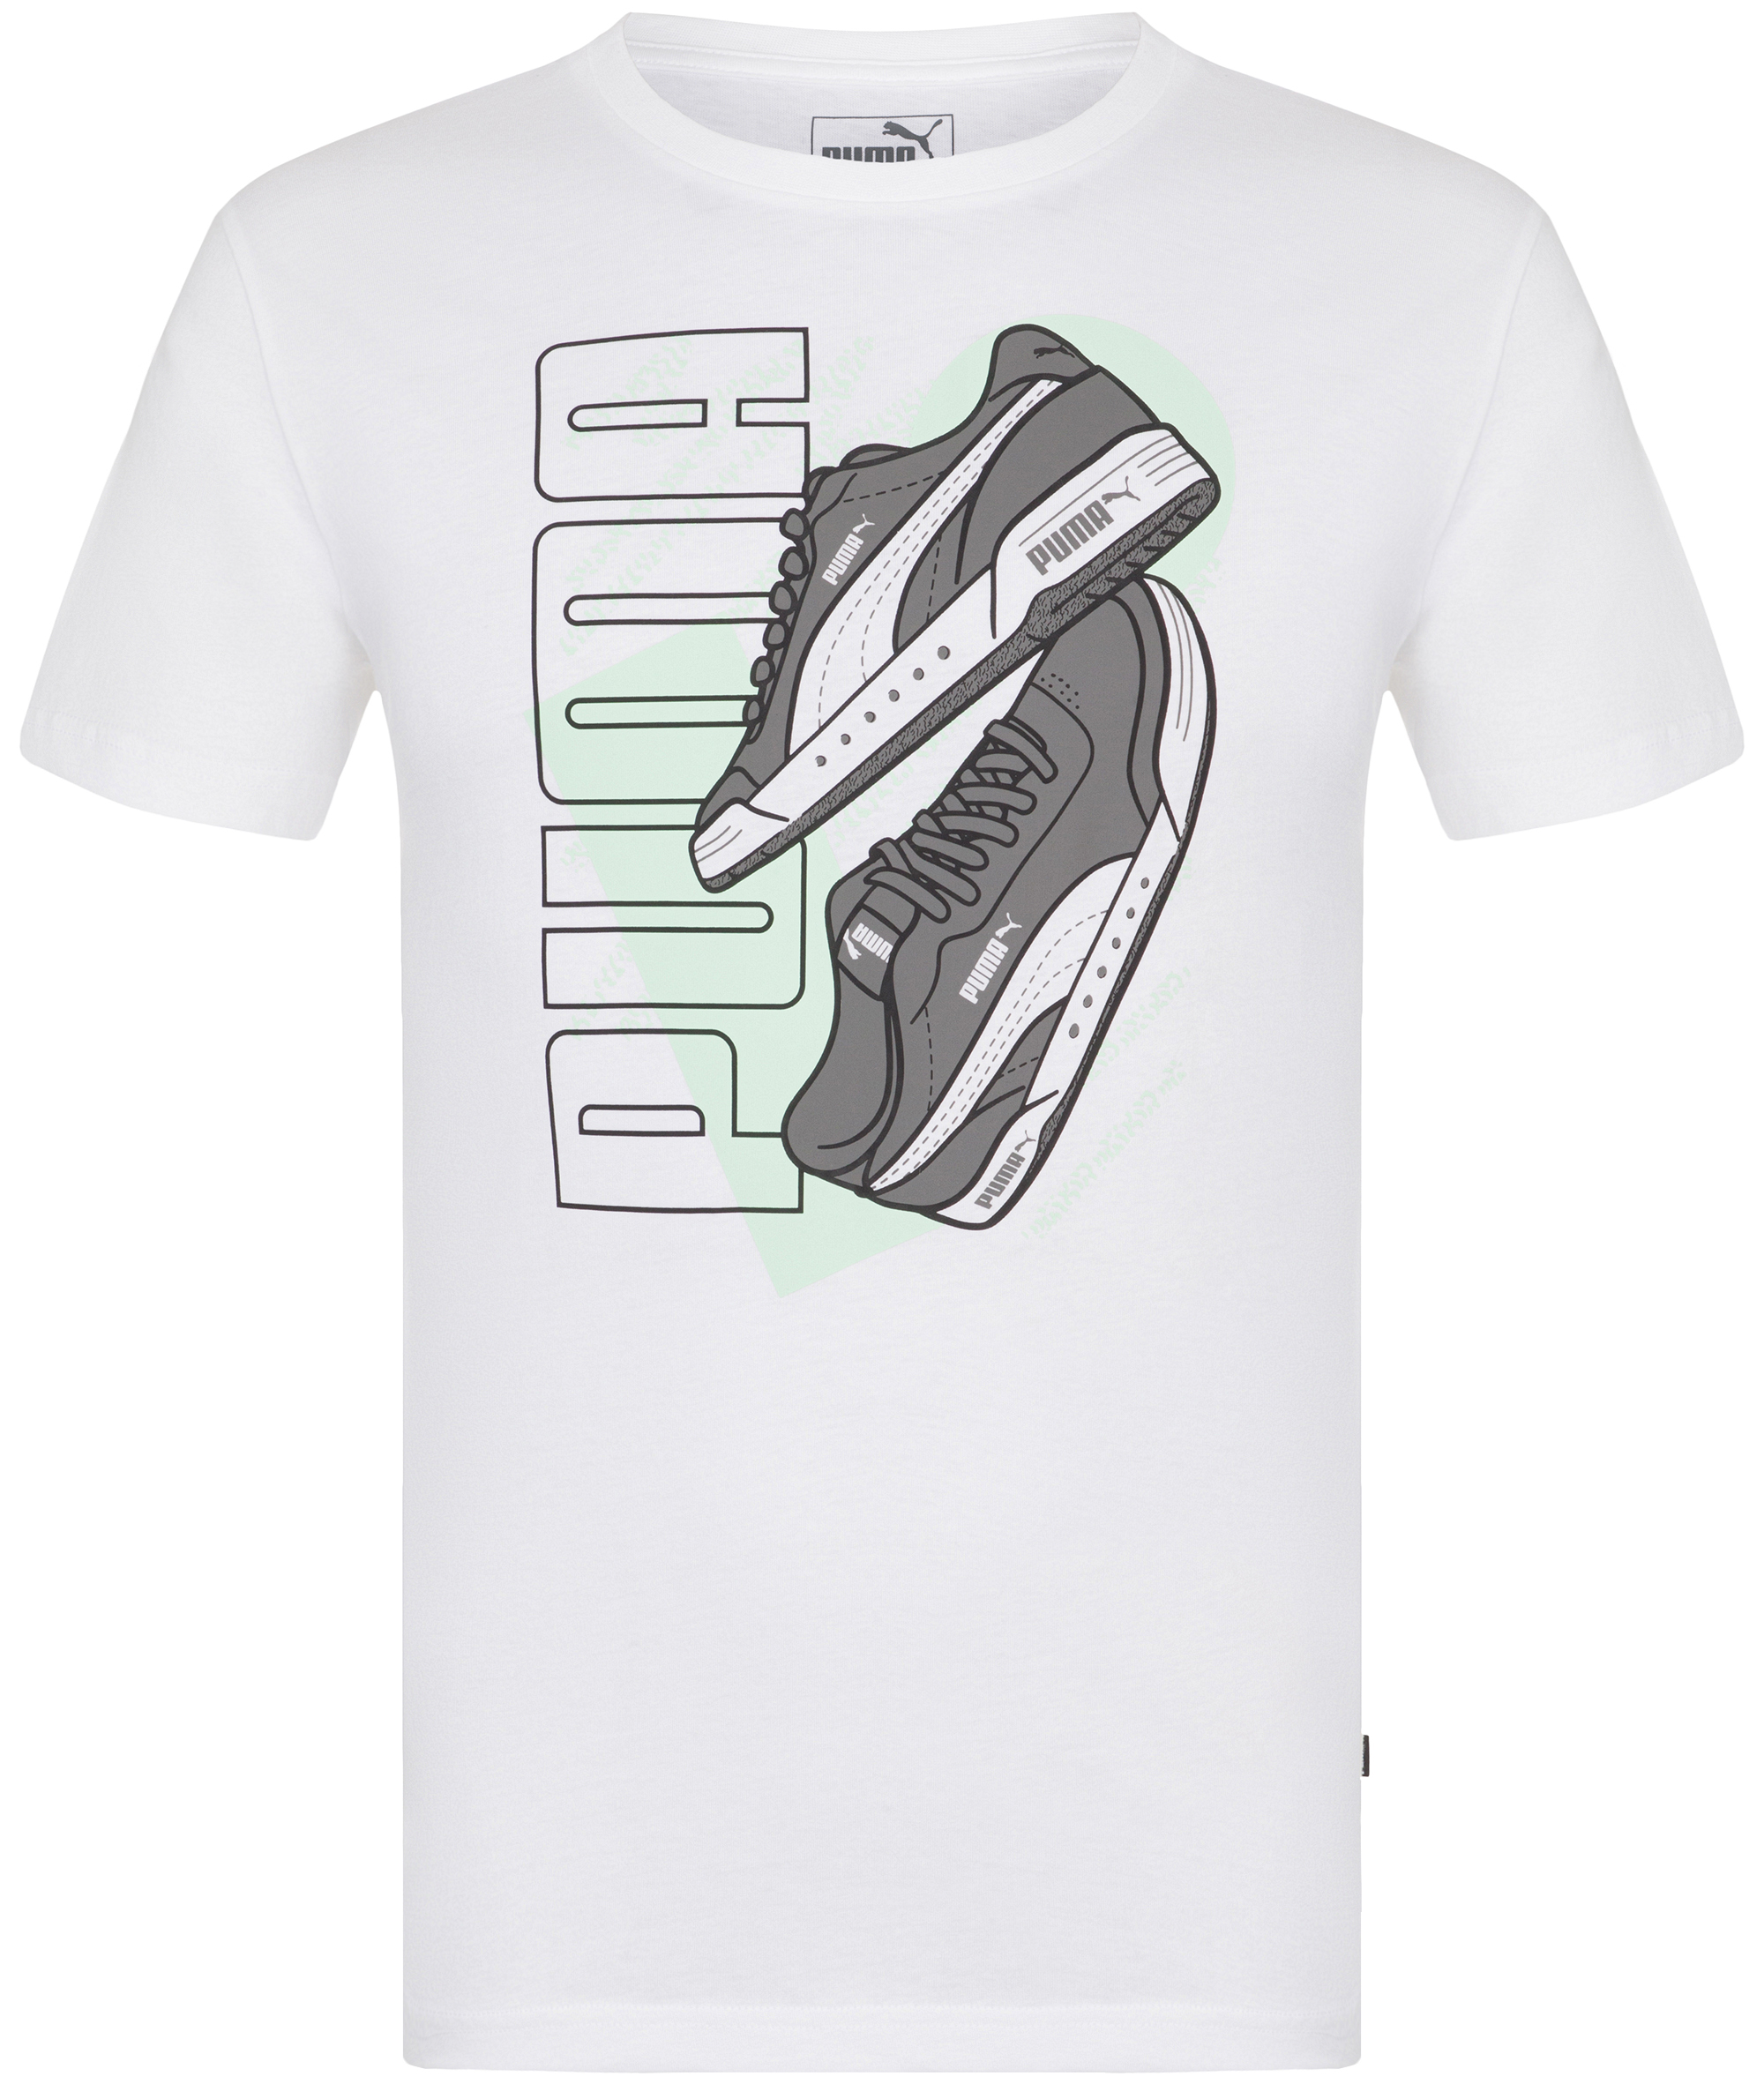 Puma Футболка мужская Puma Sneaker Graphic Tee, размер 48-50 футболка мужская reebok wor c graphic tee цвет серый ay2245 размер m 48 50